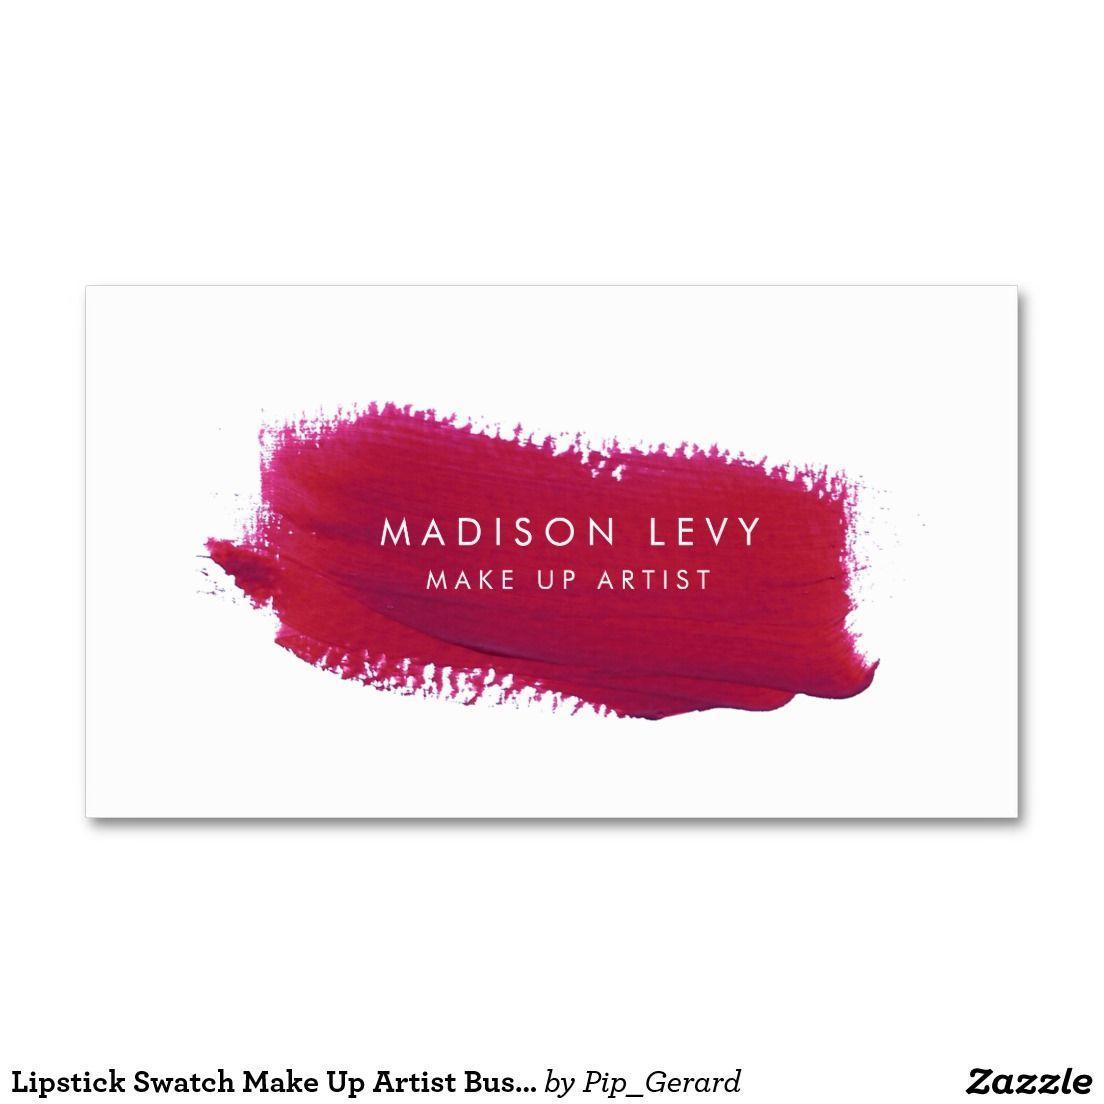 lippenstift muster bilden knstler visitenkarten visitenkarten - Muster Visitenkarten